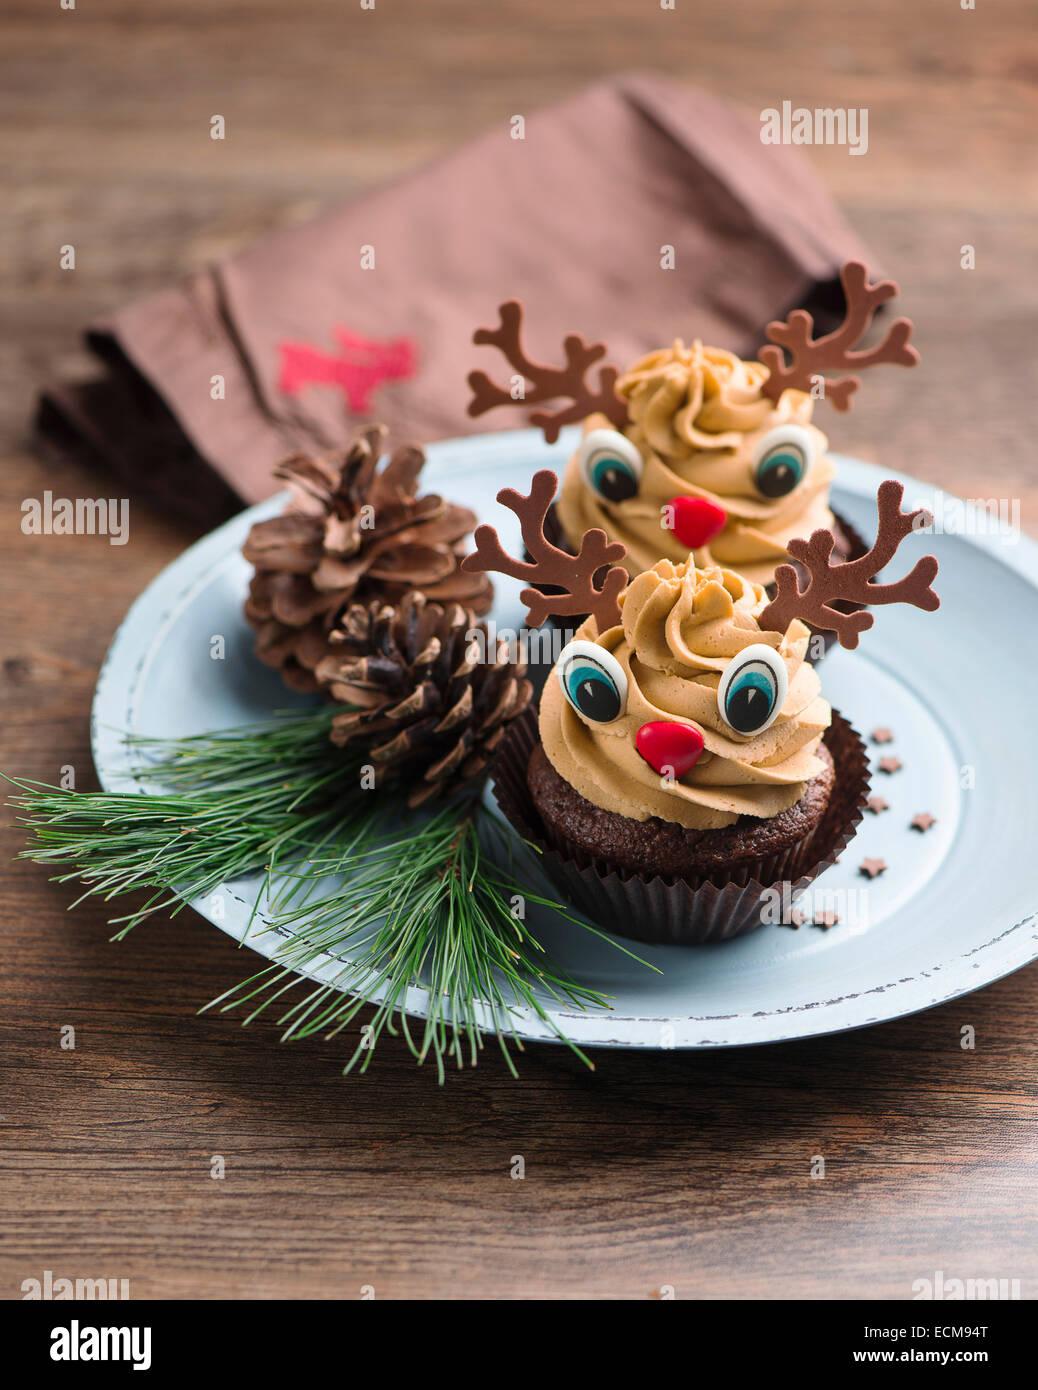 Christmas cupcakes - Stock Image